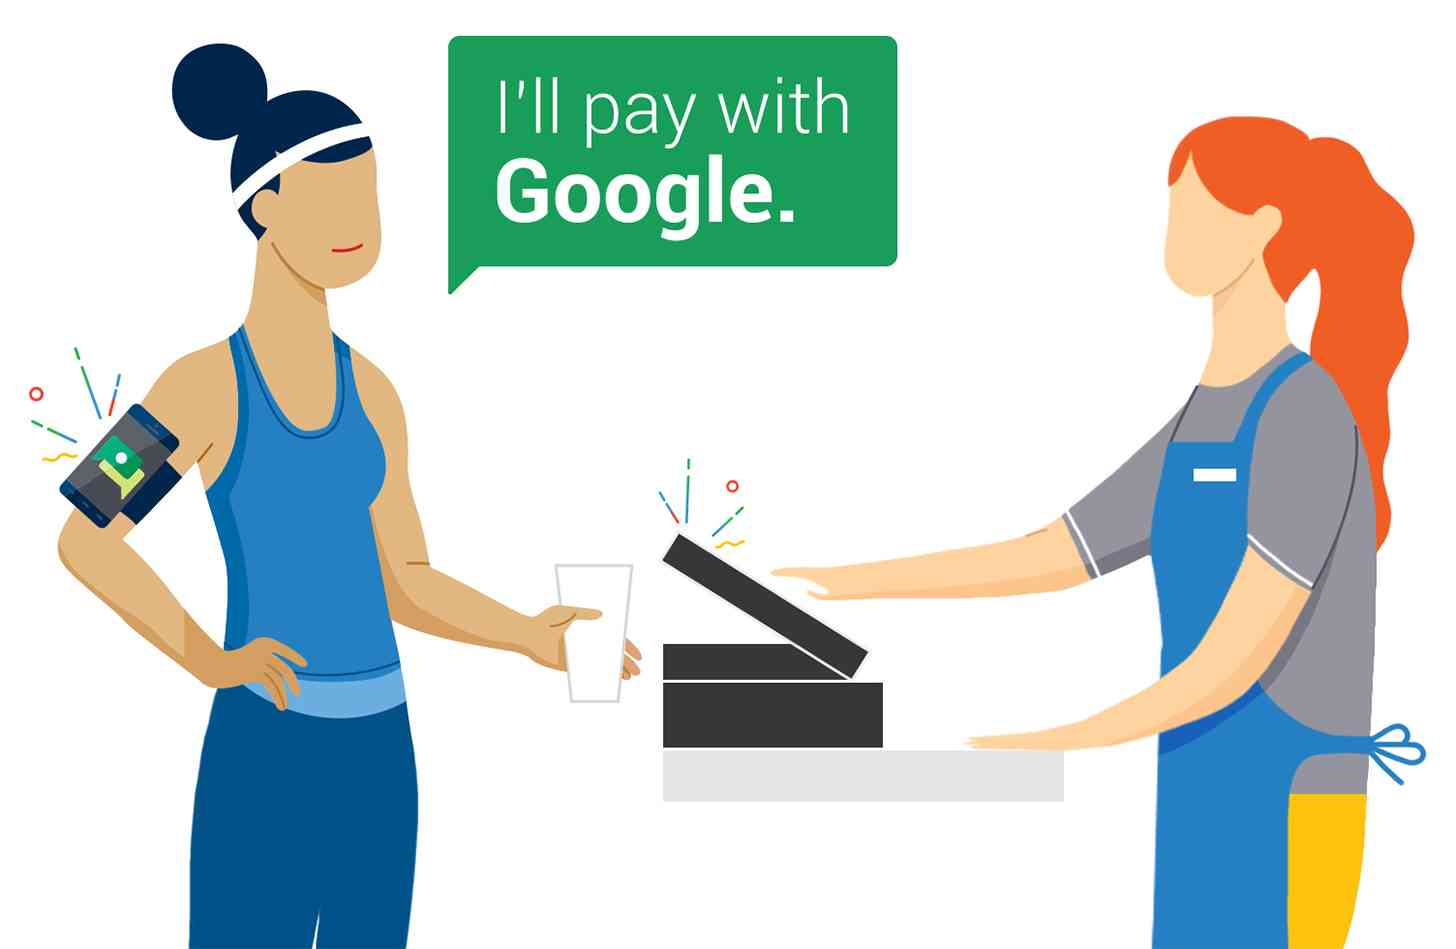 Google Hands Free payment app